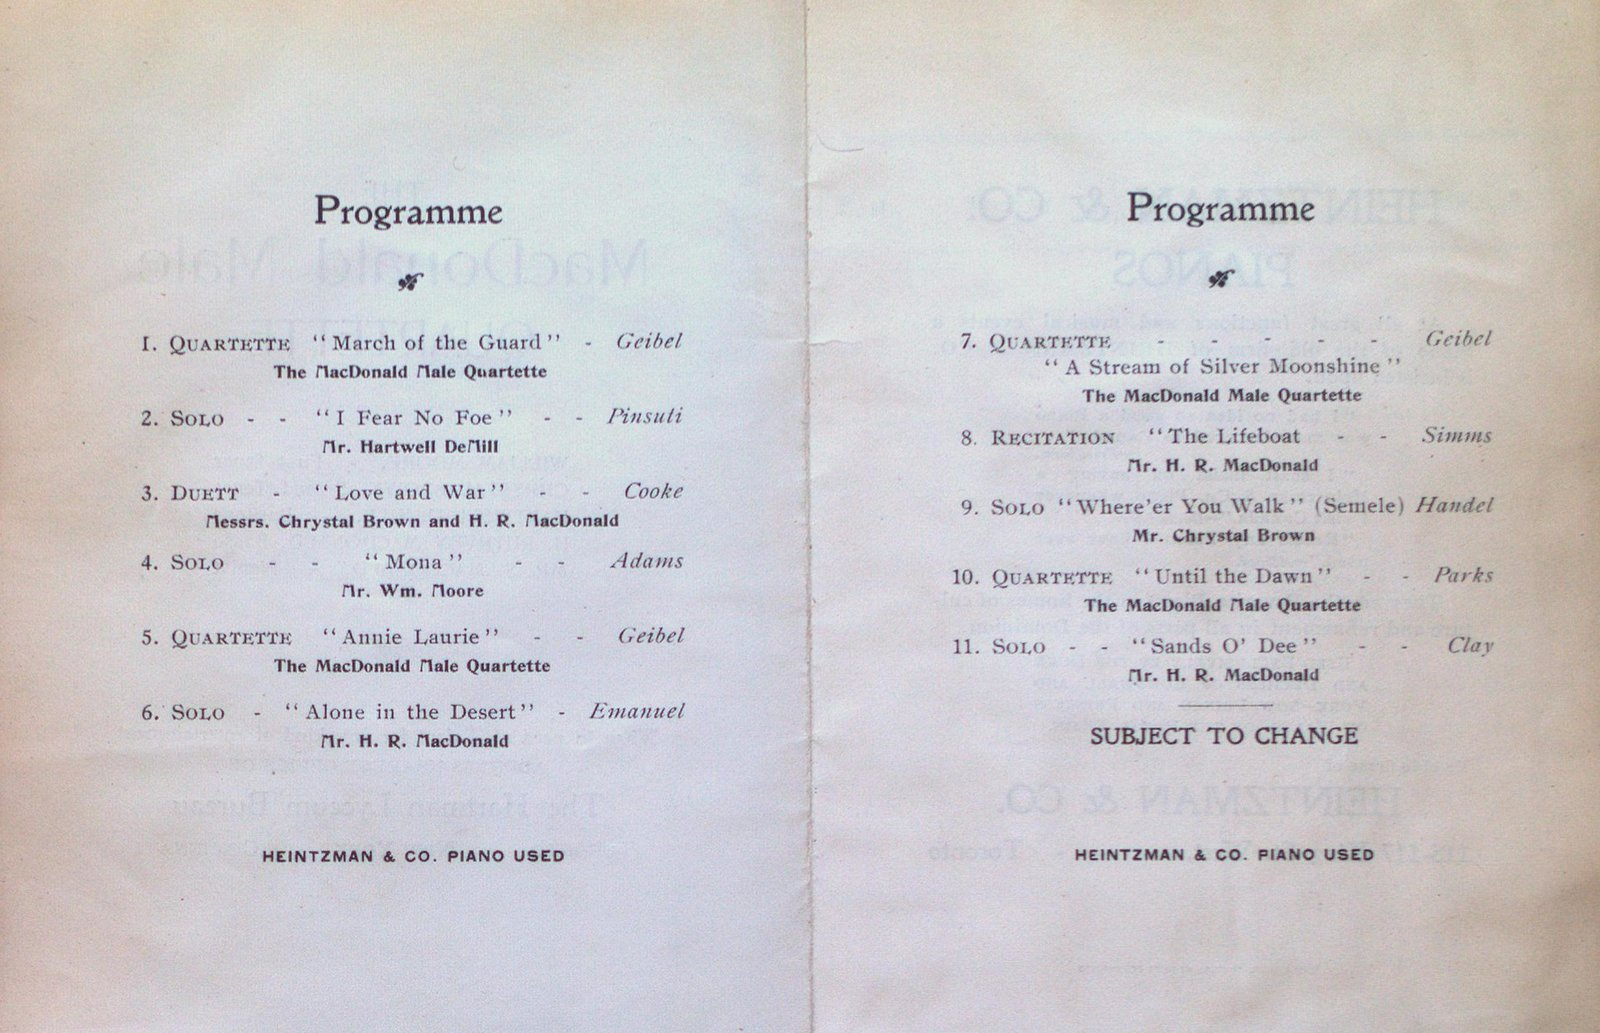 Teresa Vanderburgh's Musical Scrapbook #2 - Program for the MacDonald Male Quartette